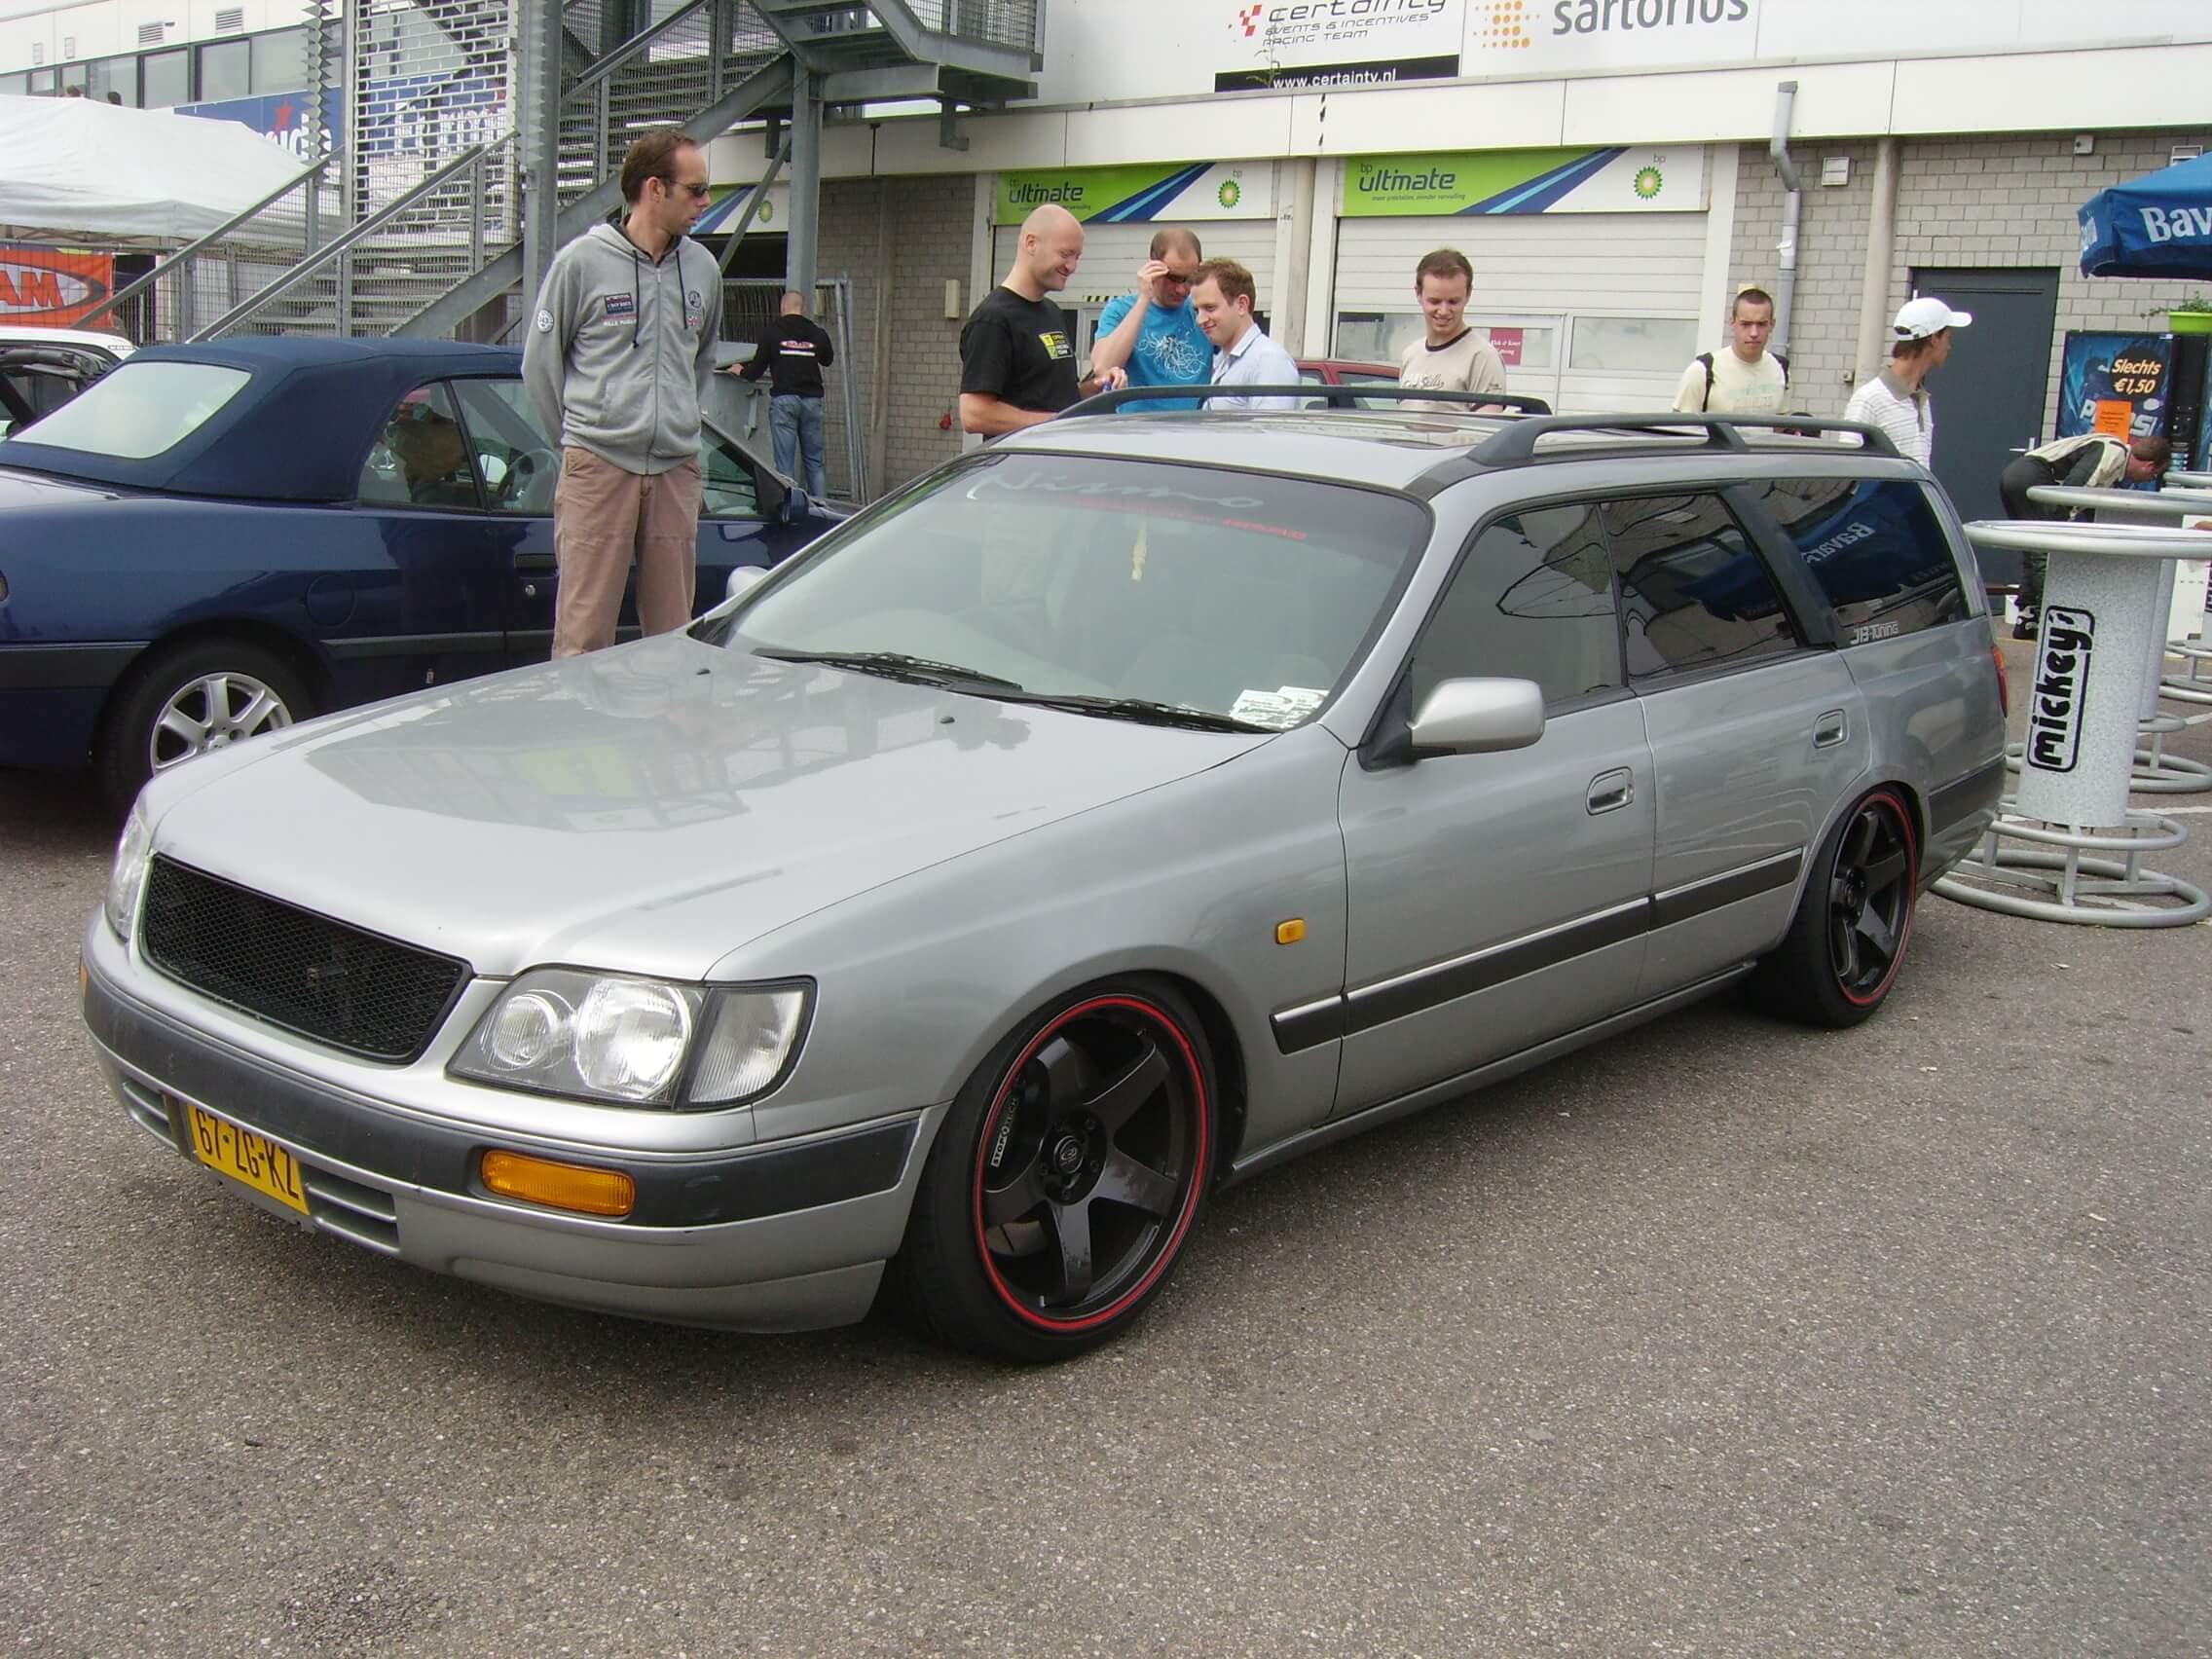 67-ZG-KZ: NISSAN ESTATE uit 1996